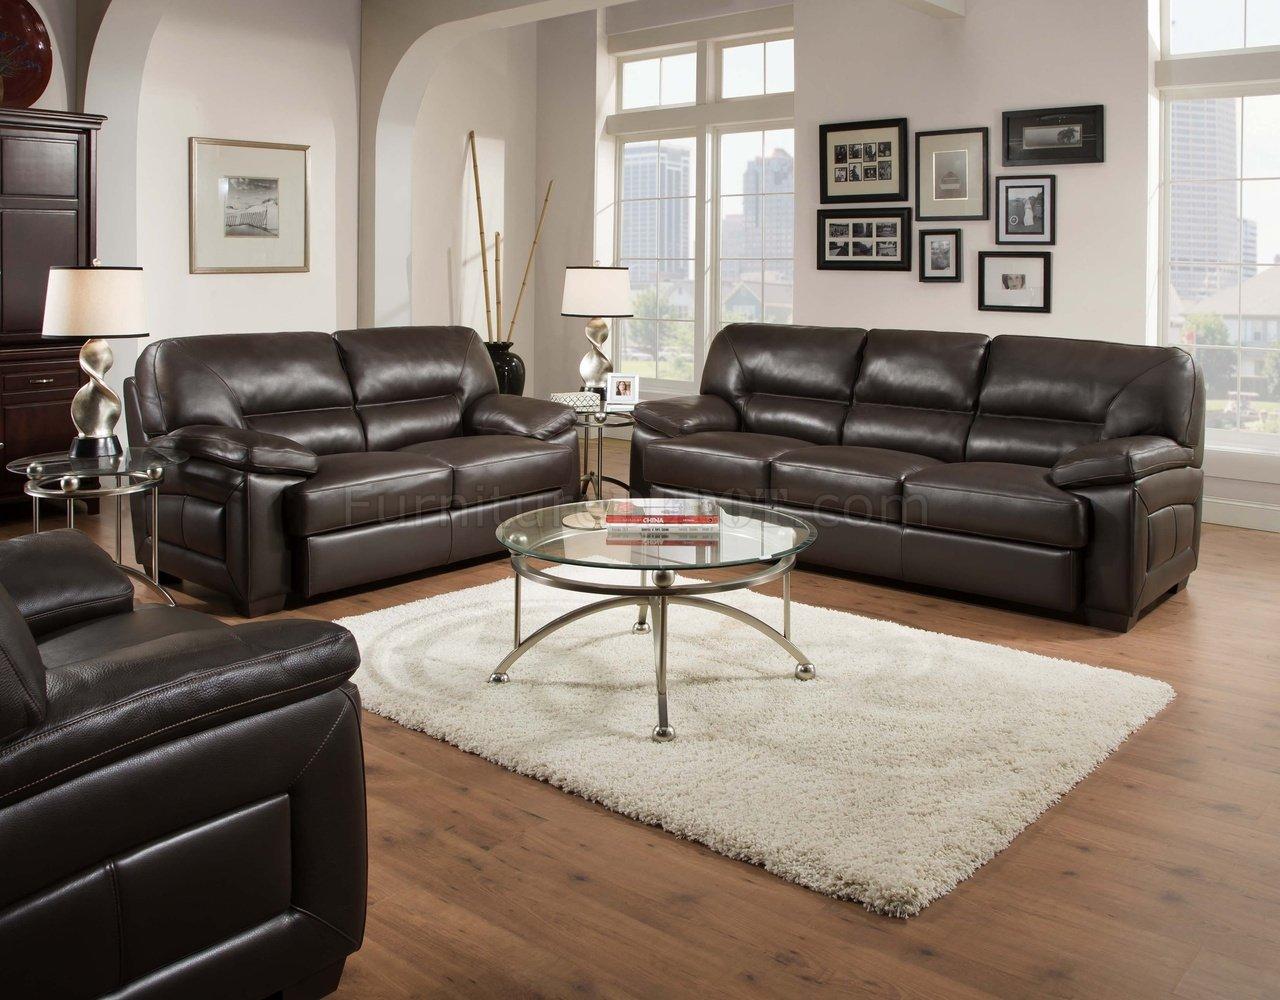 top grain leather sofa set plastic legs uk truffle brown modern and loveseat